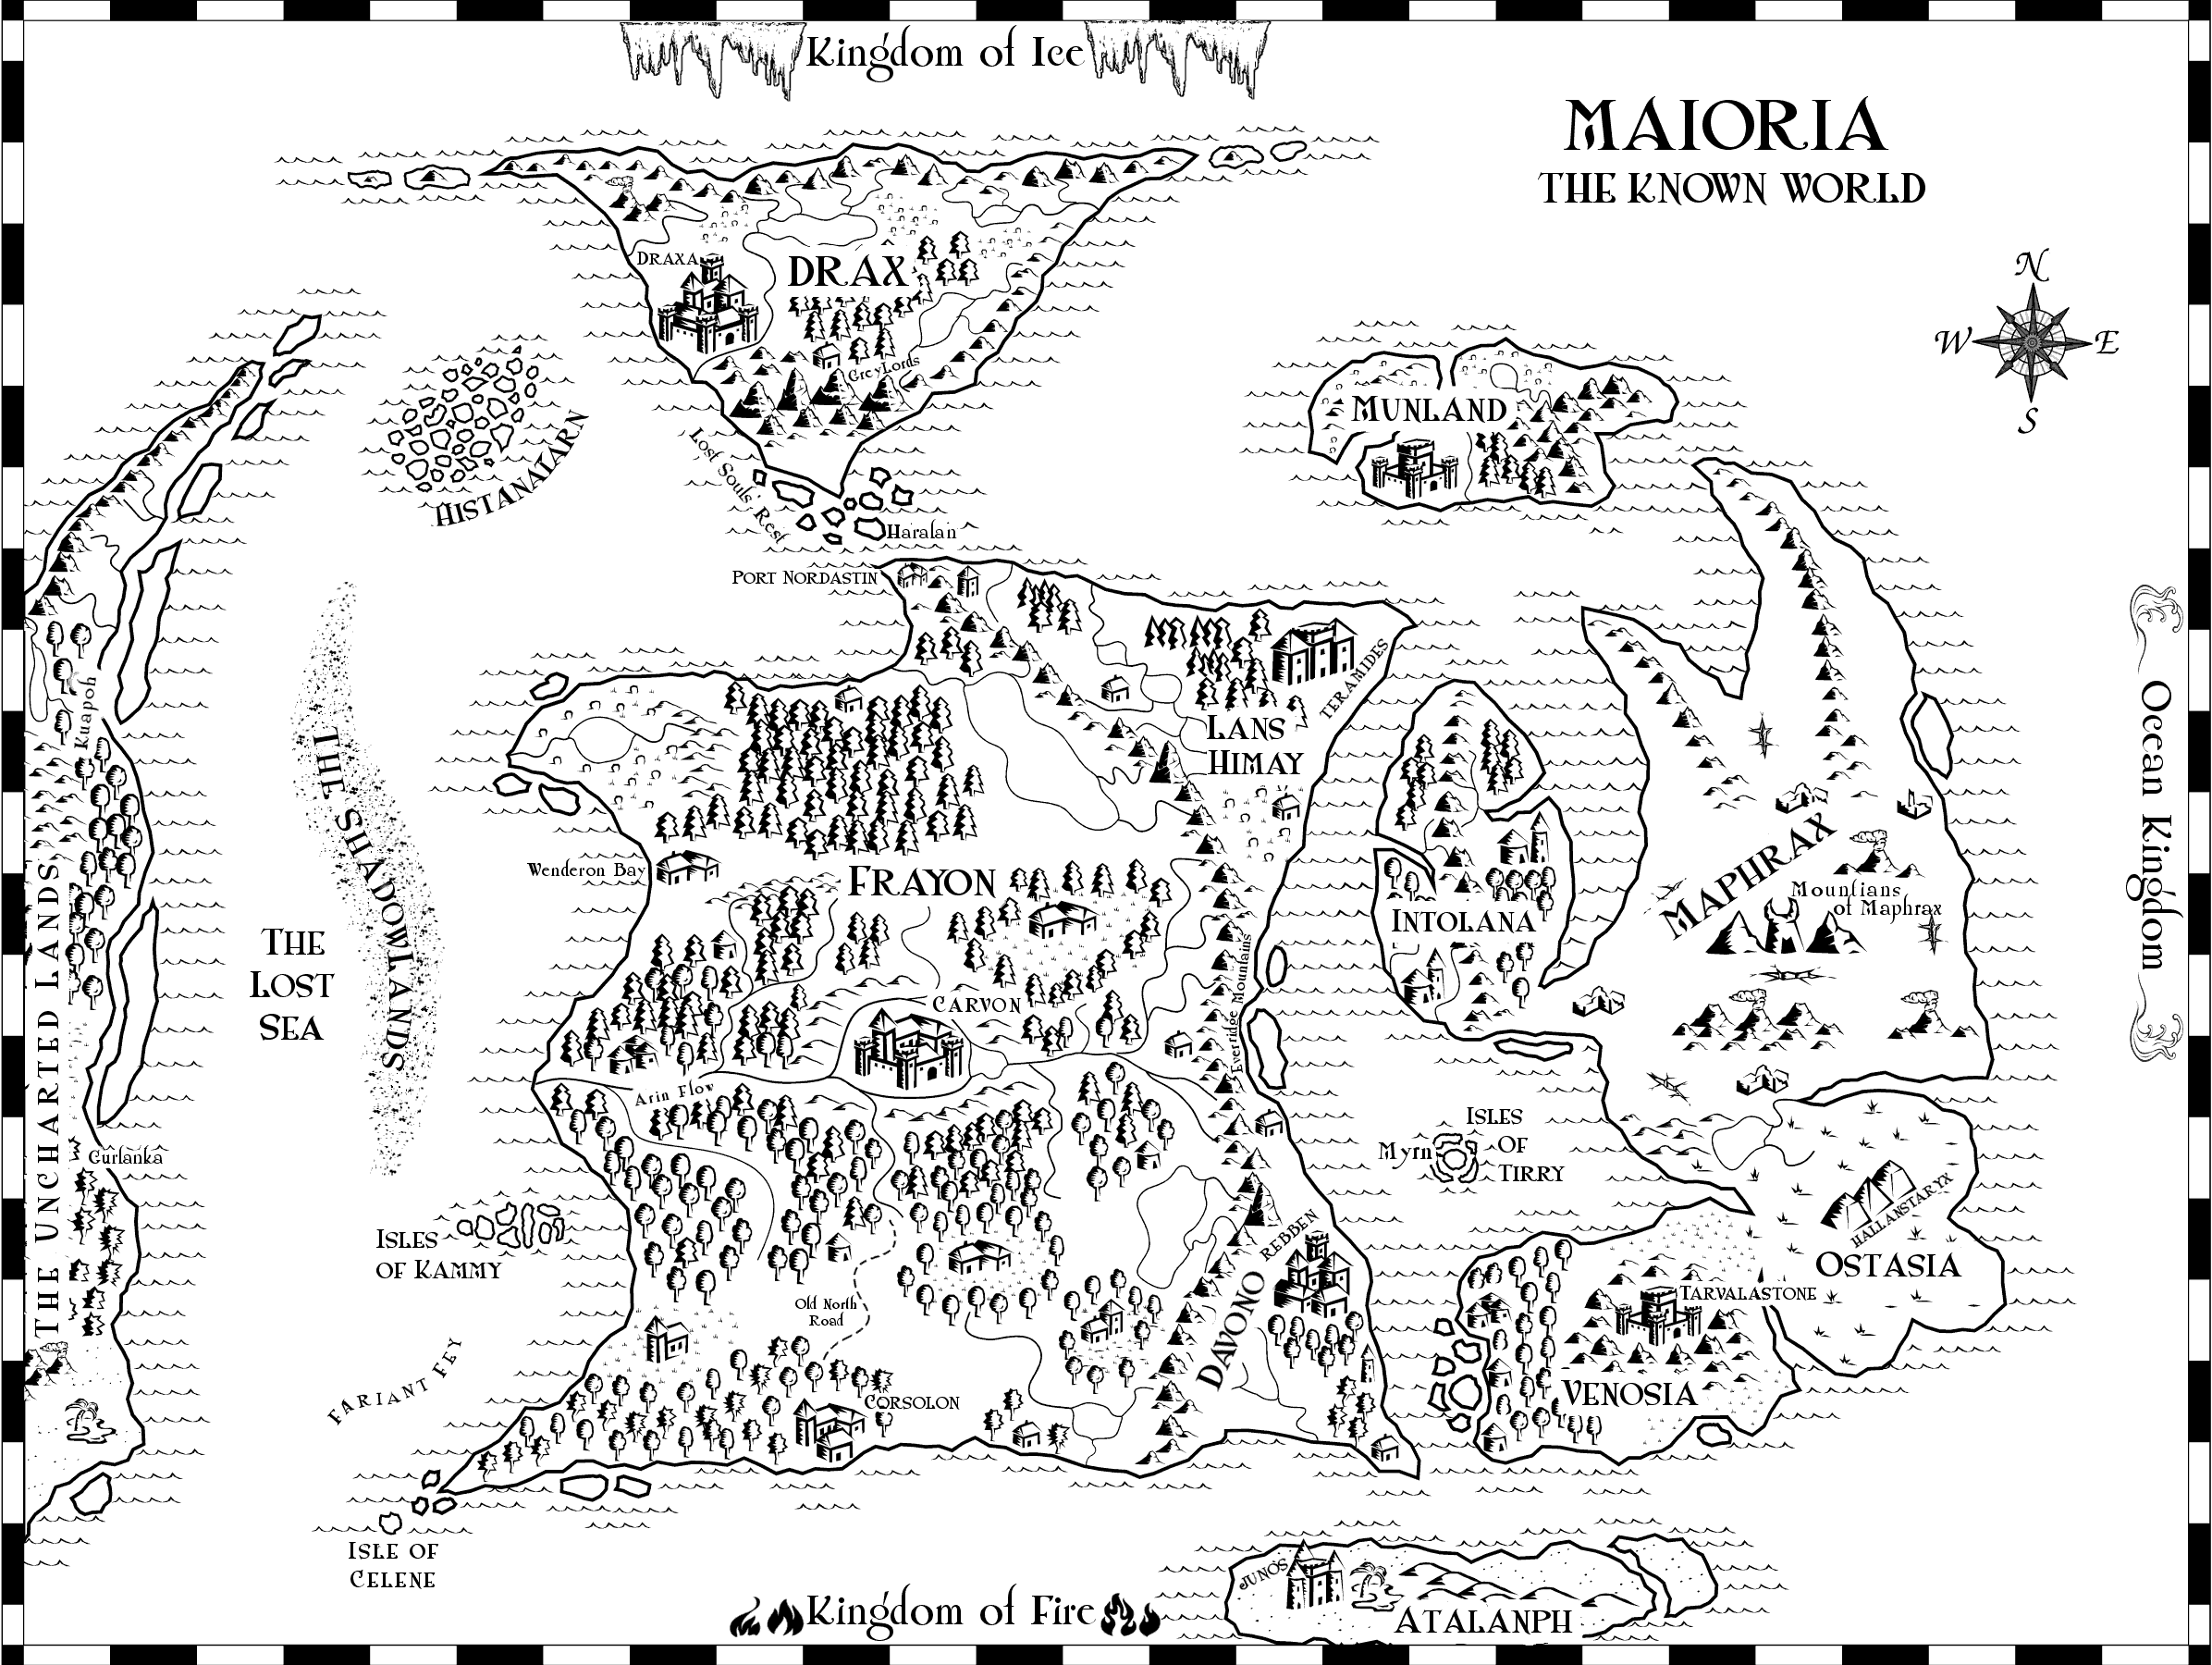 Maplarge